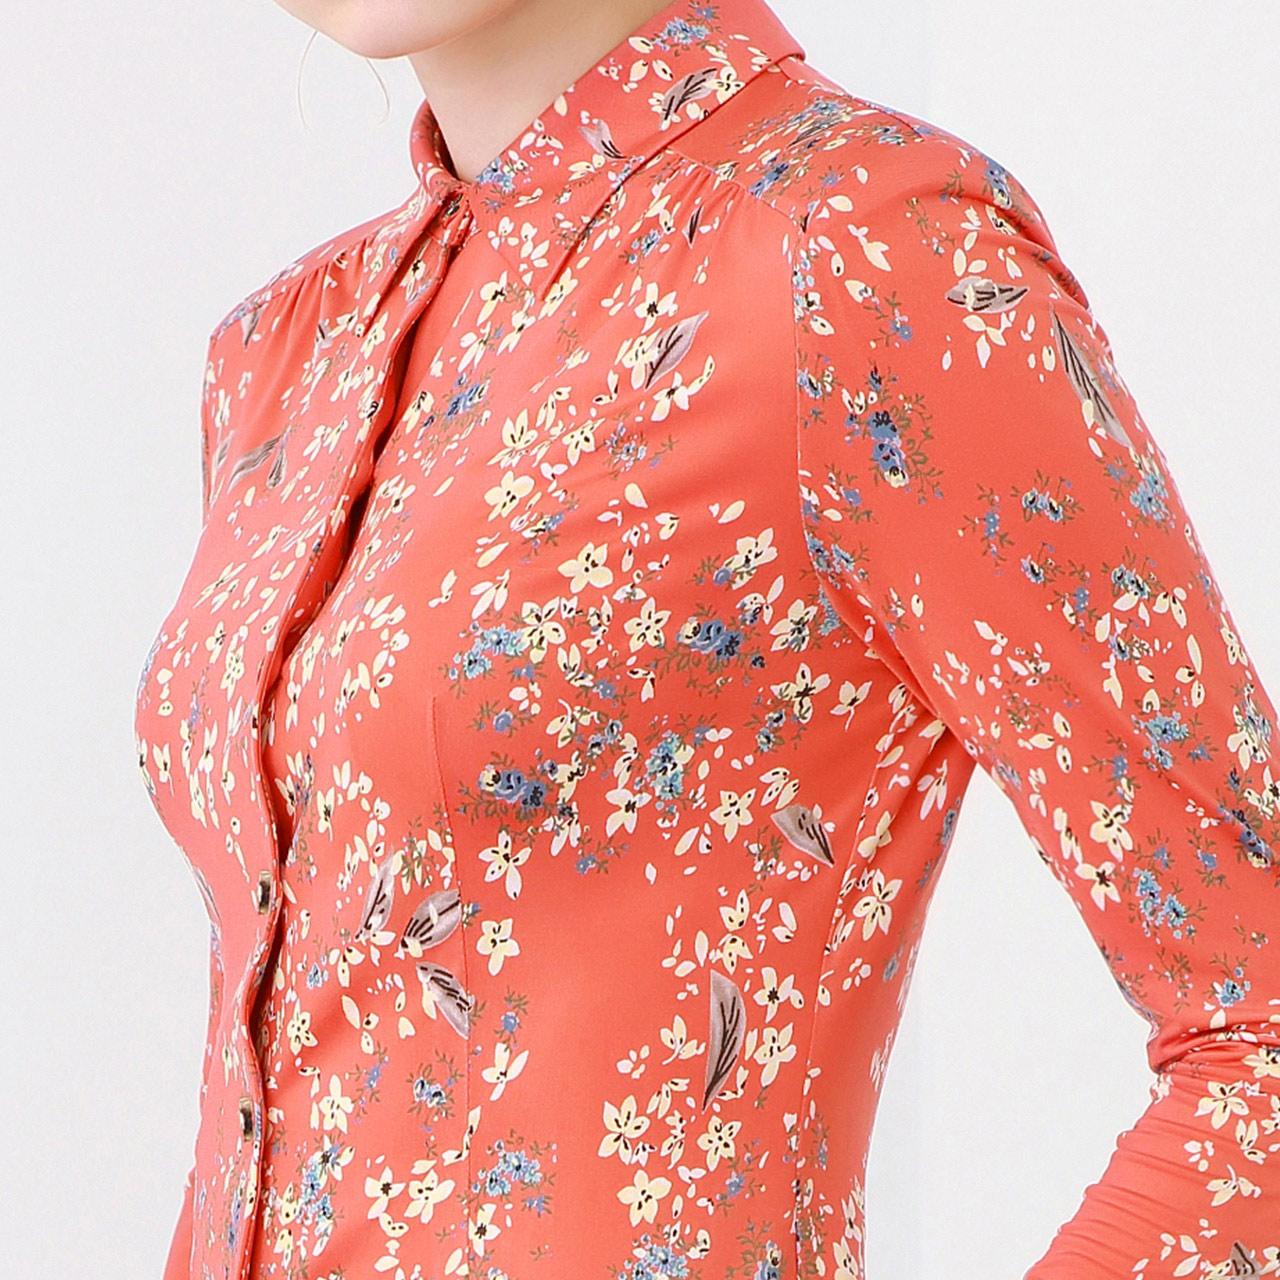 MORELINE沐兰女装2018春夏新款经典优雅浪漫印花长袖衬衫18153611